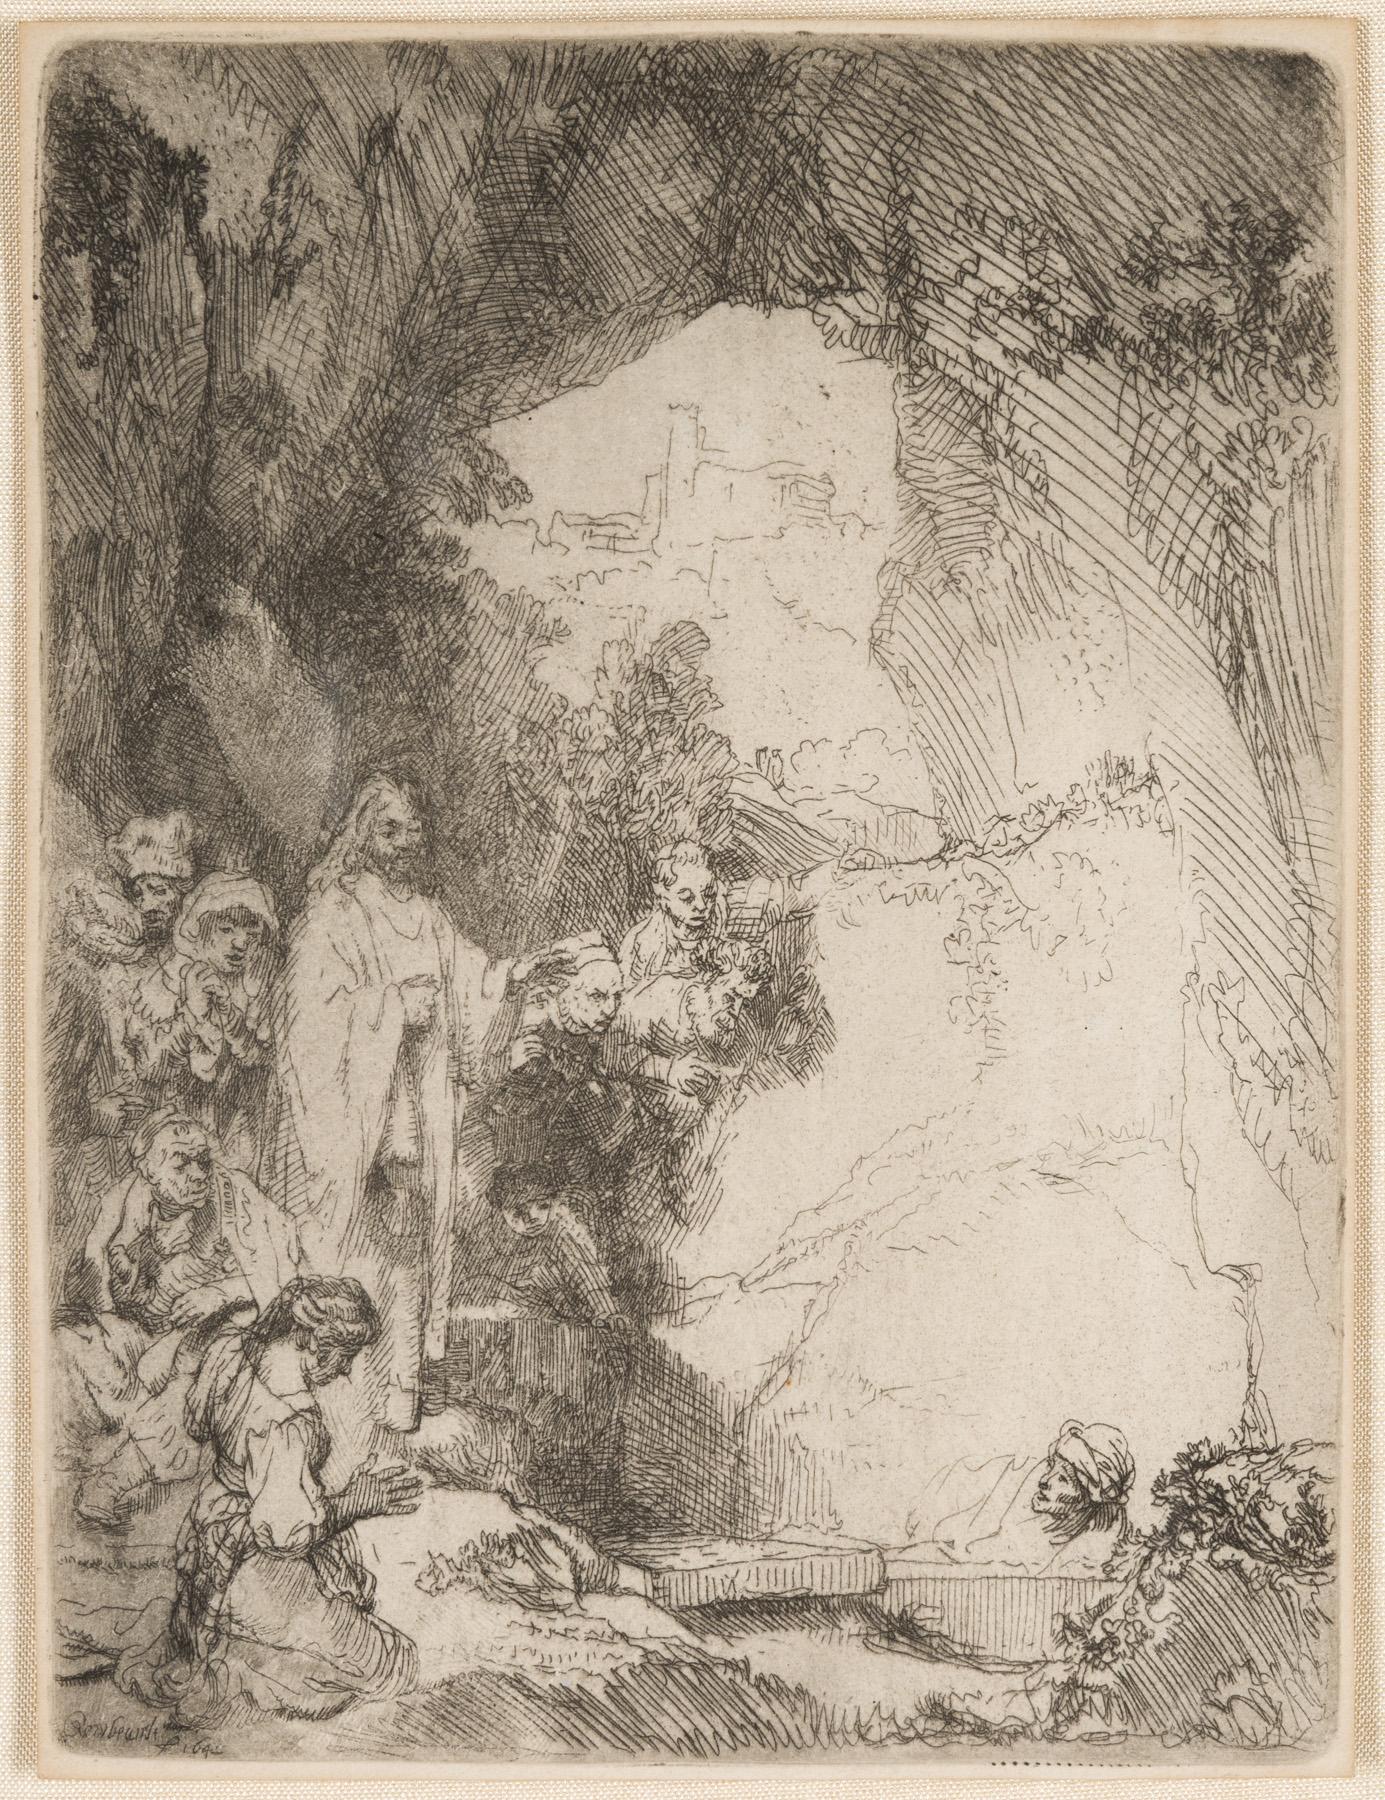 The Raising of Lazarus. Small Plate by Harmensz van Rijn Rembrandt